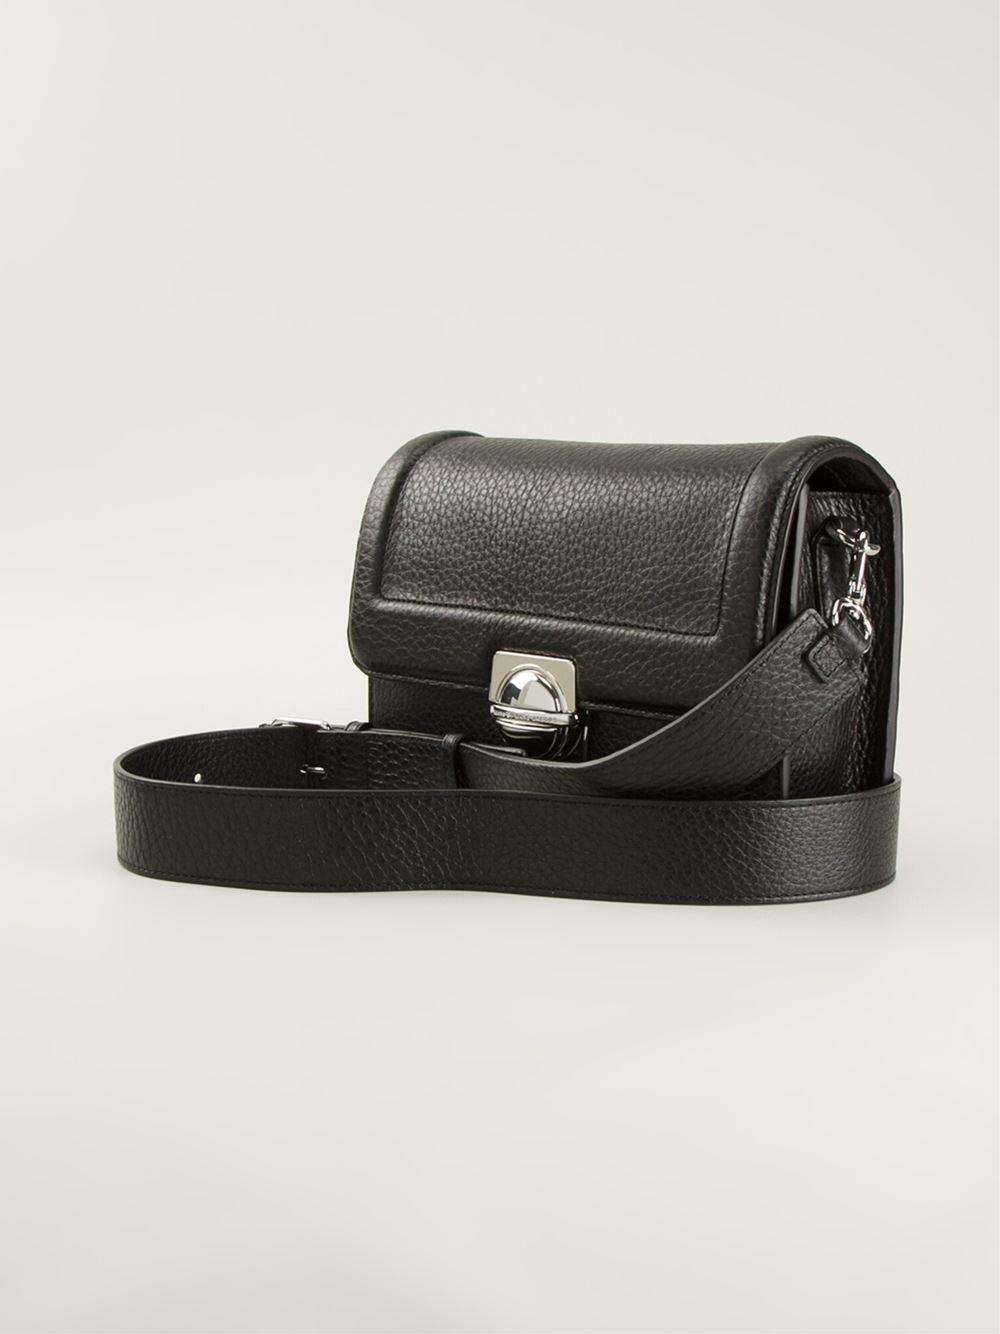 Marc By Marc Jacobs 'Top Schooly Jax' Cross Body Bag in Black